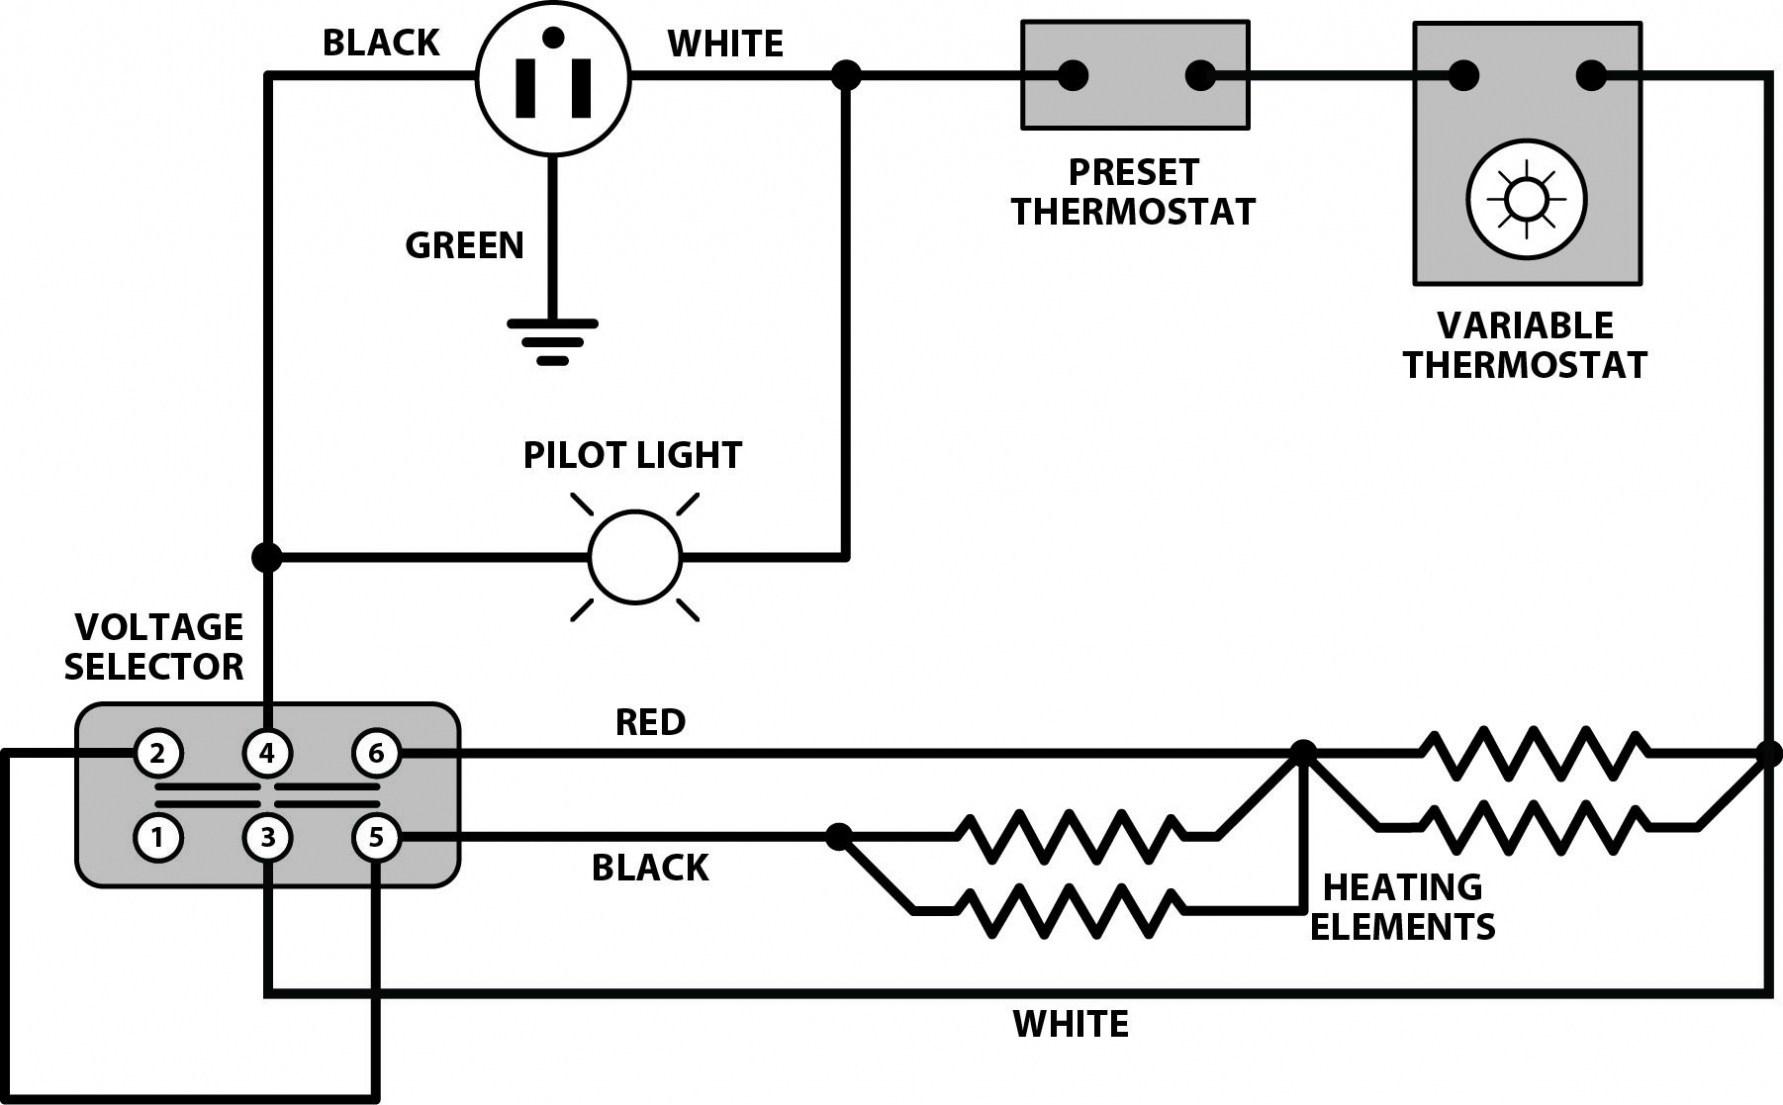 State Water Heater Wiring Diagram | Wiring Library - Water Heater Wiring Diagram Dual Element